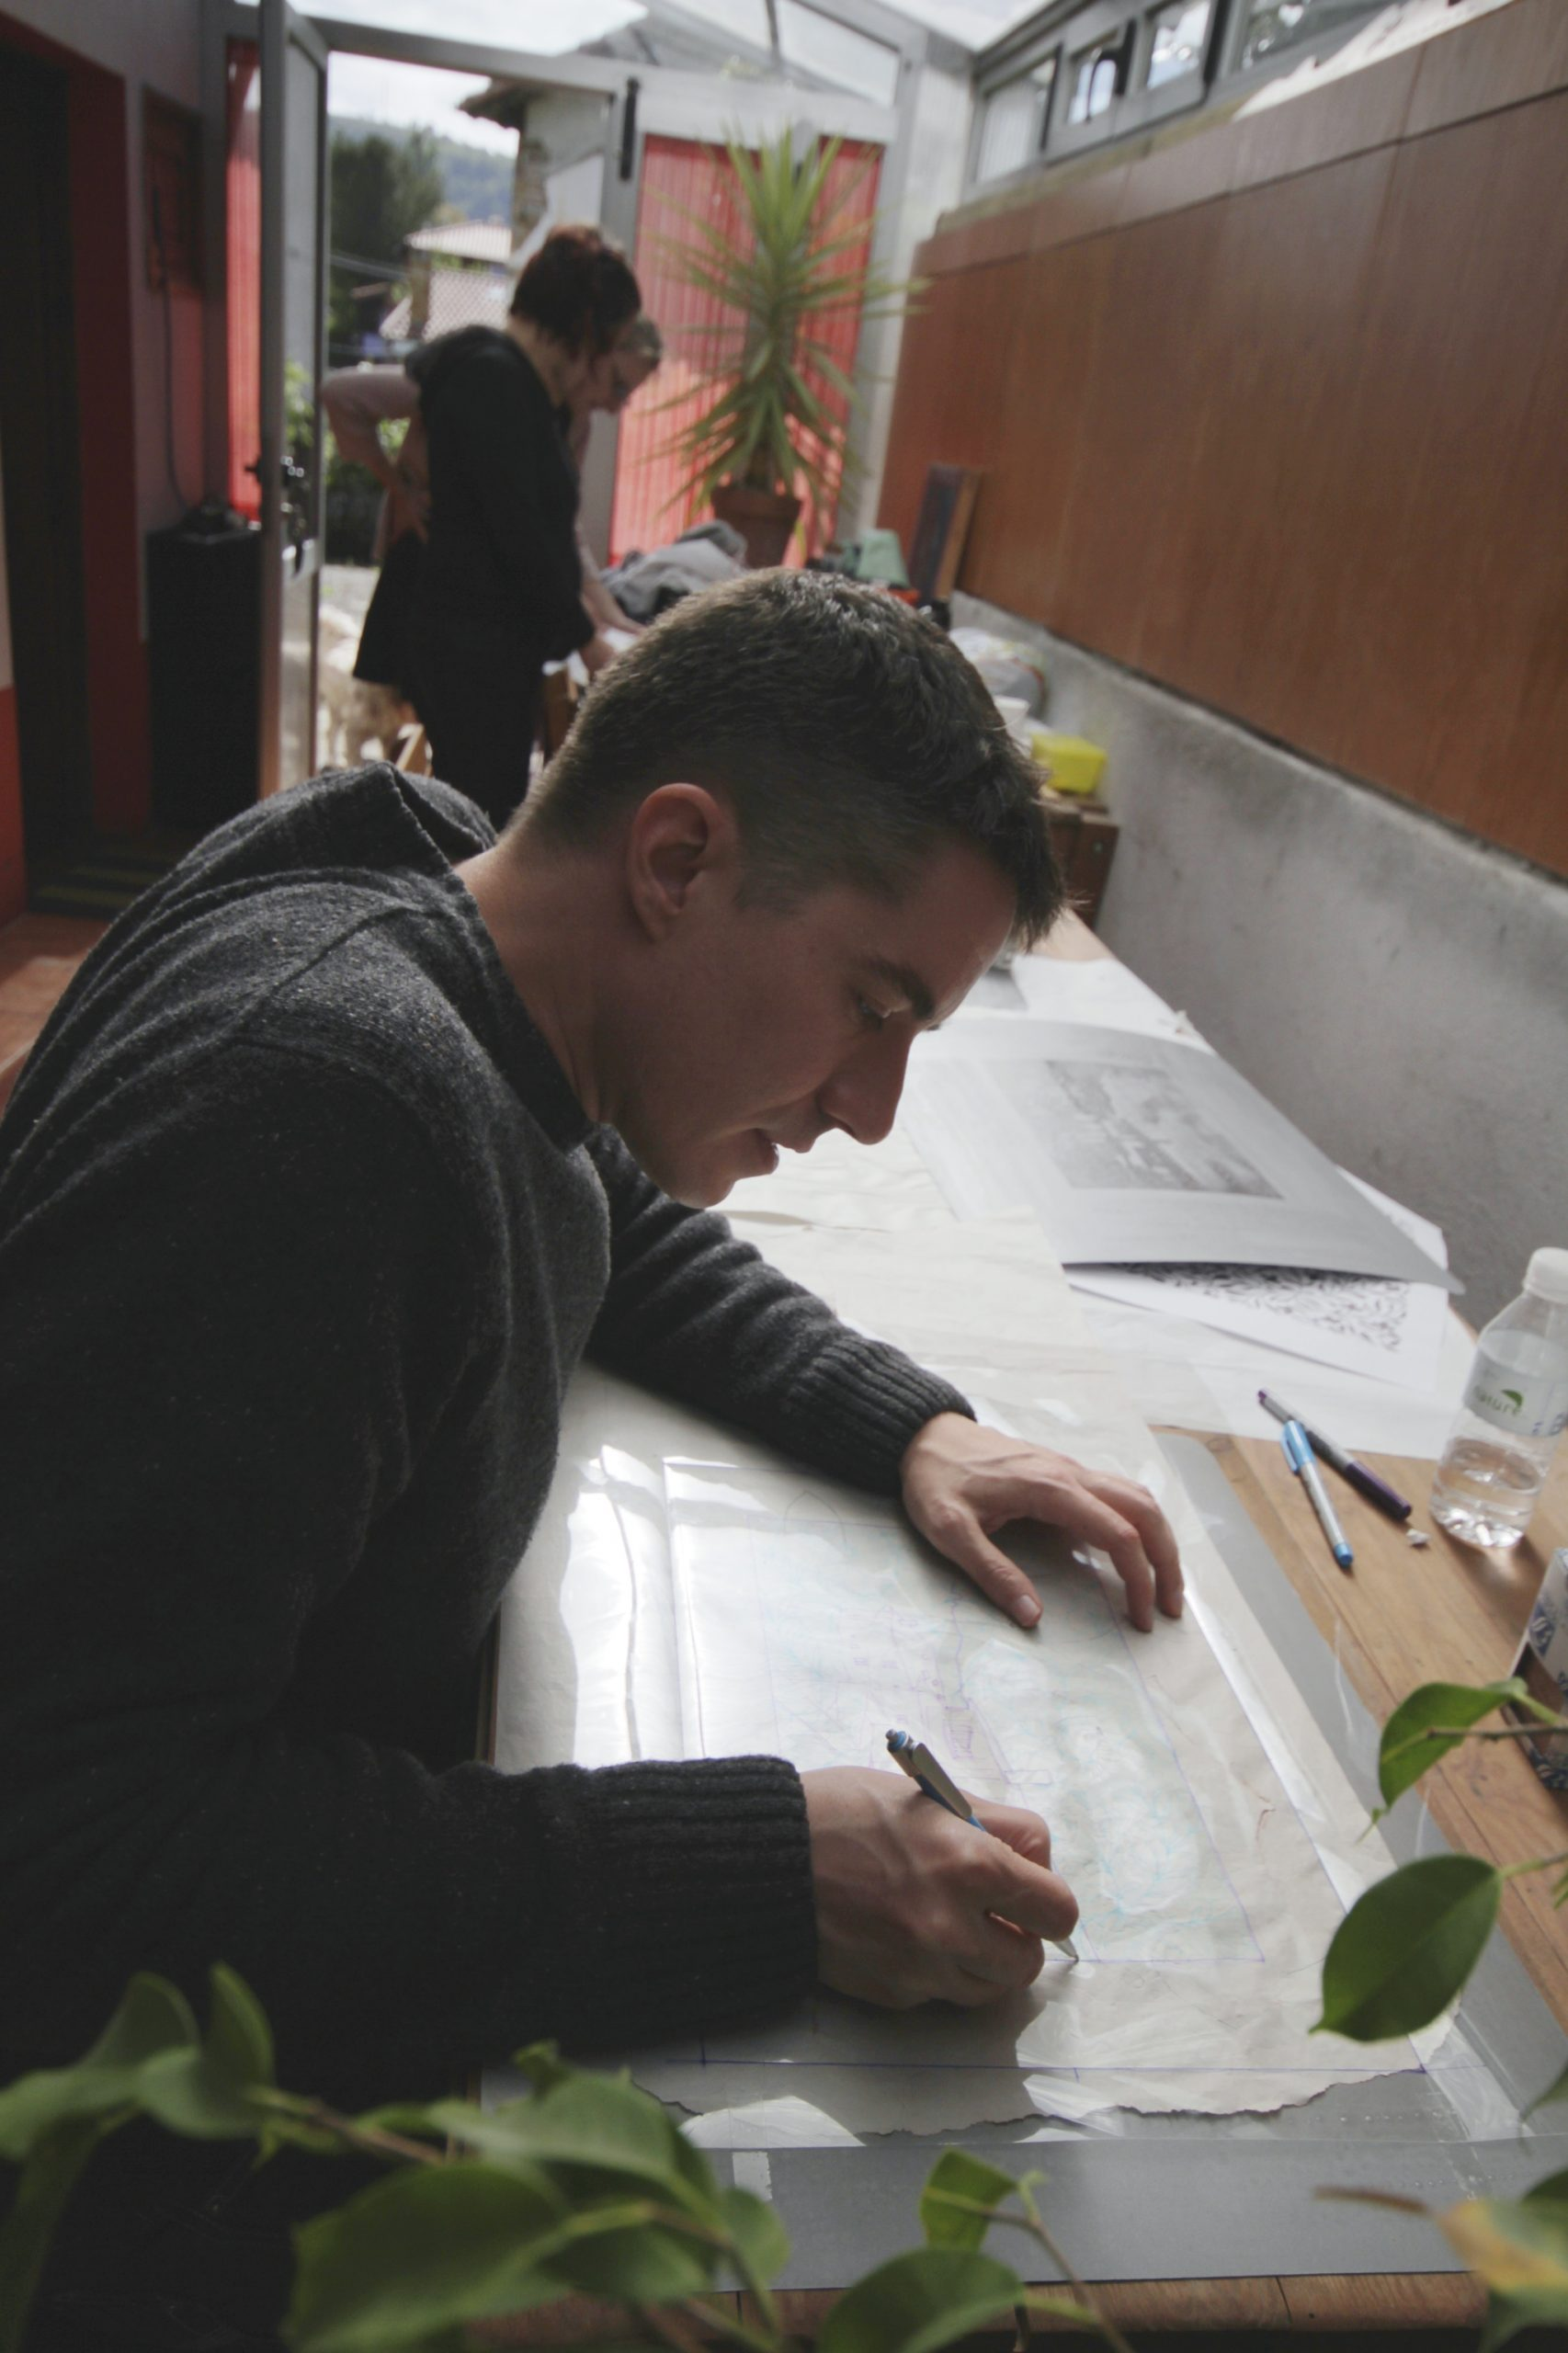 Dan Holmgreen